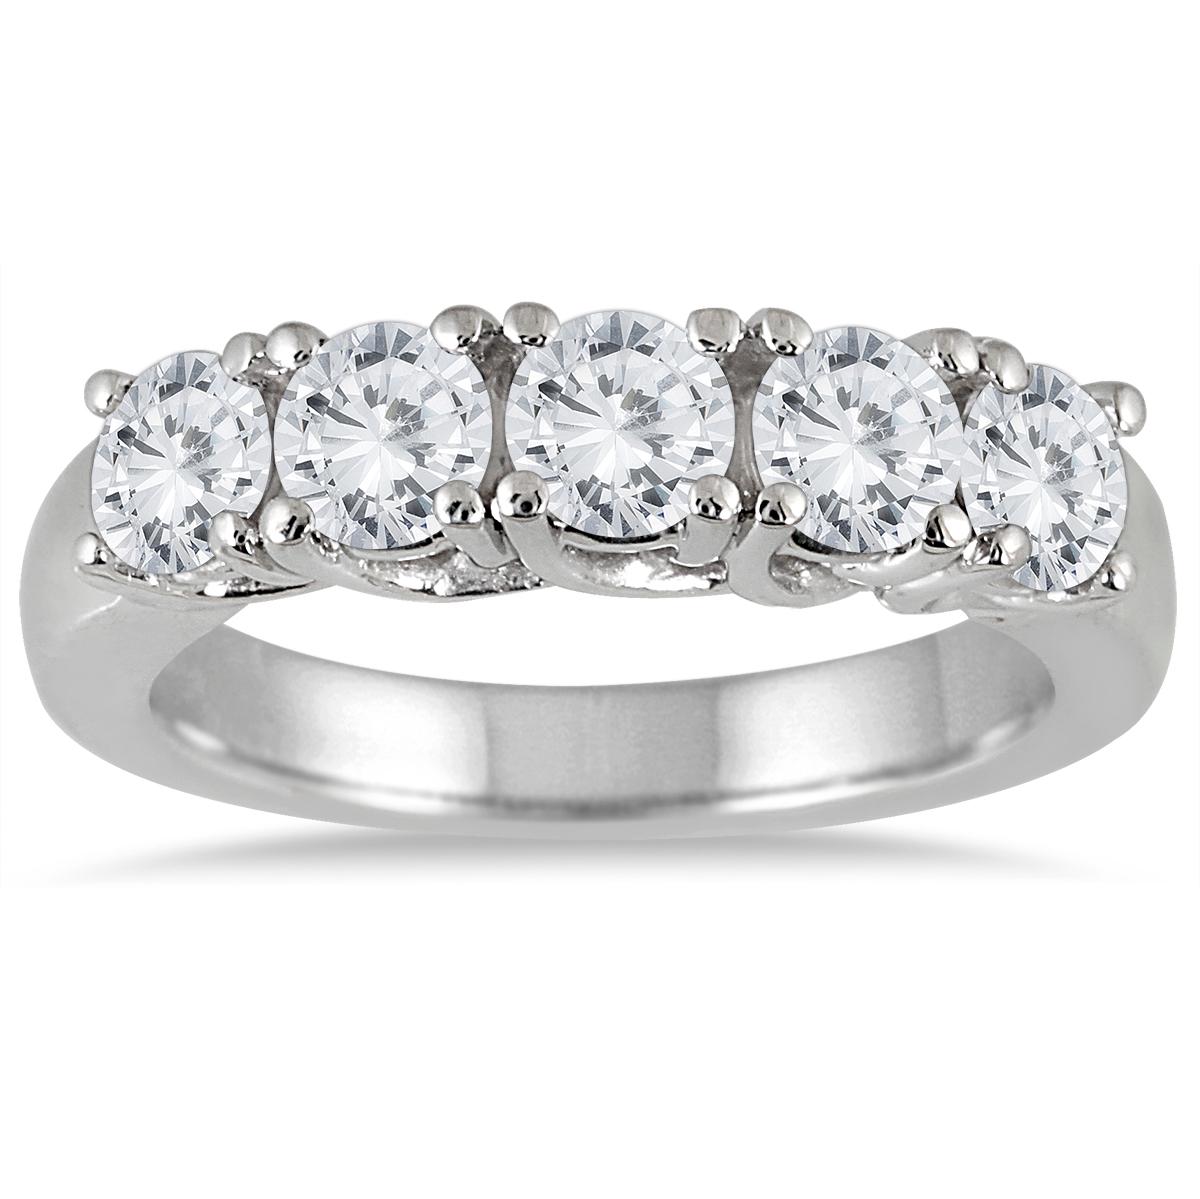 2 Carat TW Five Stone Diamond Wedding Band in 14K White Gold